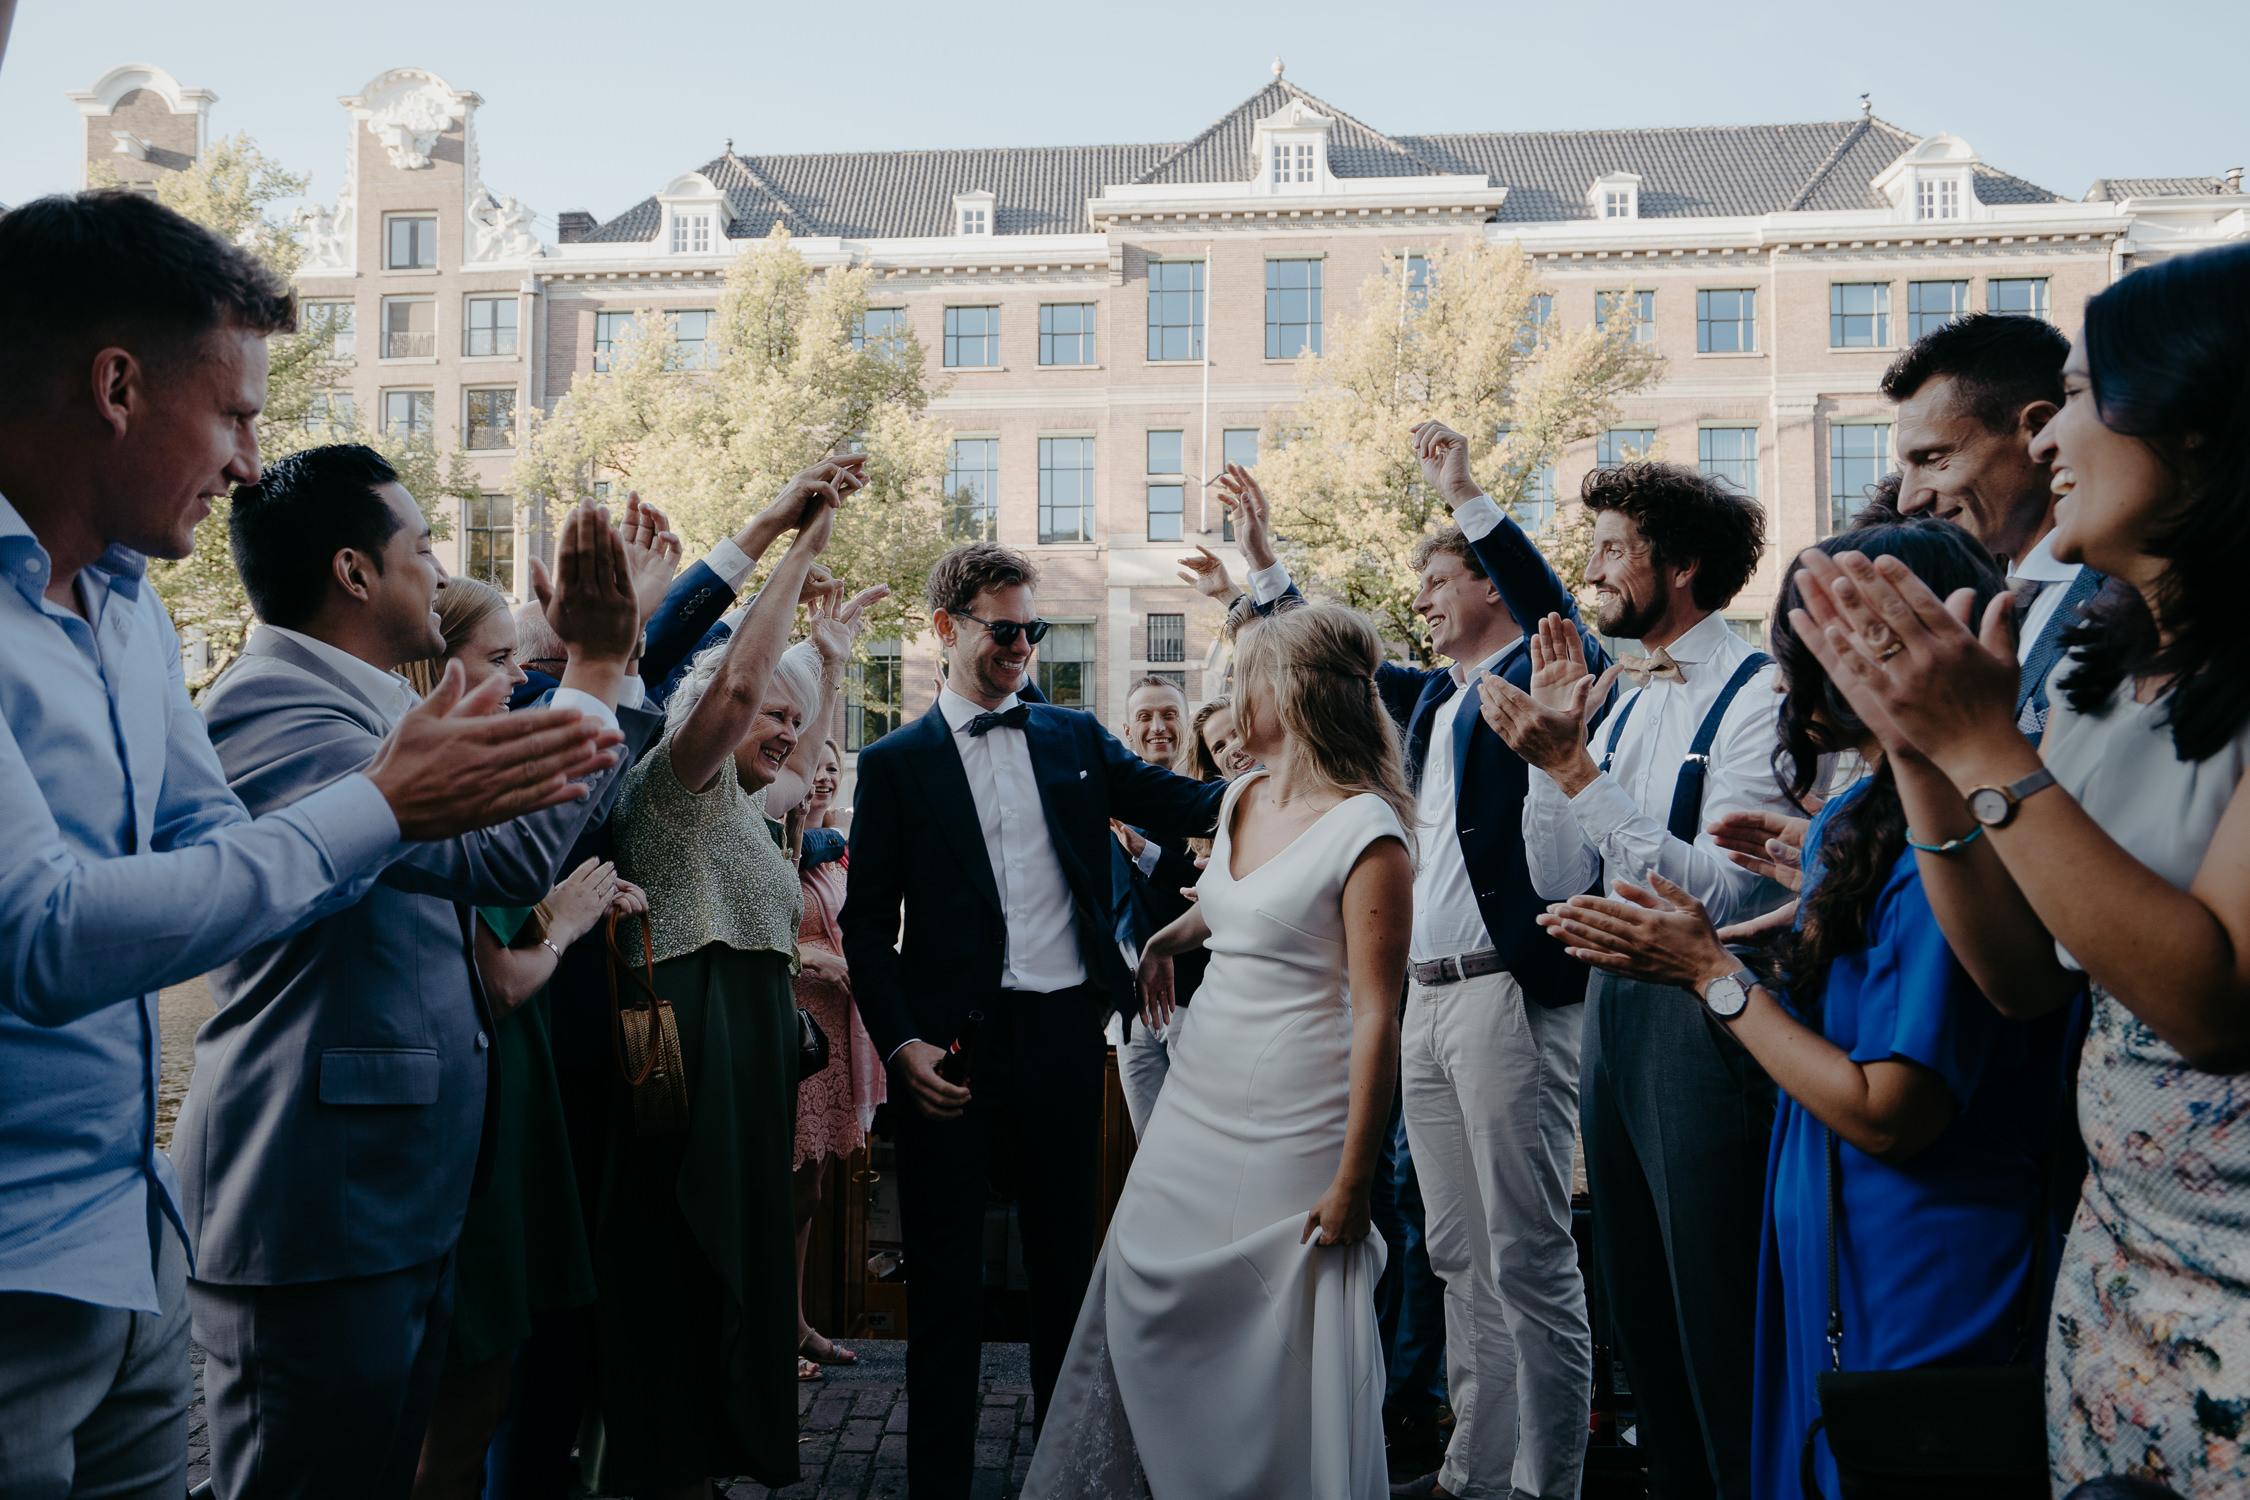 Beautiful Amsterdam wedding photographs